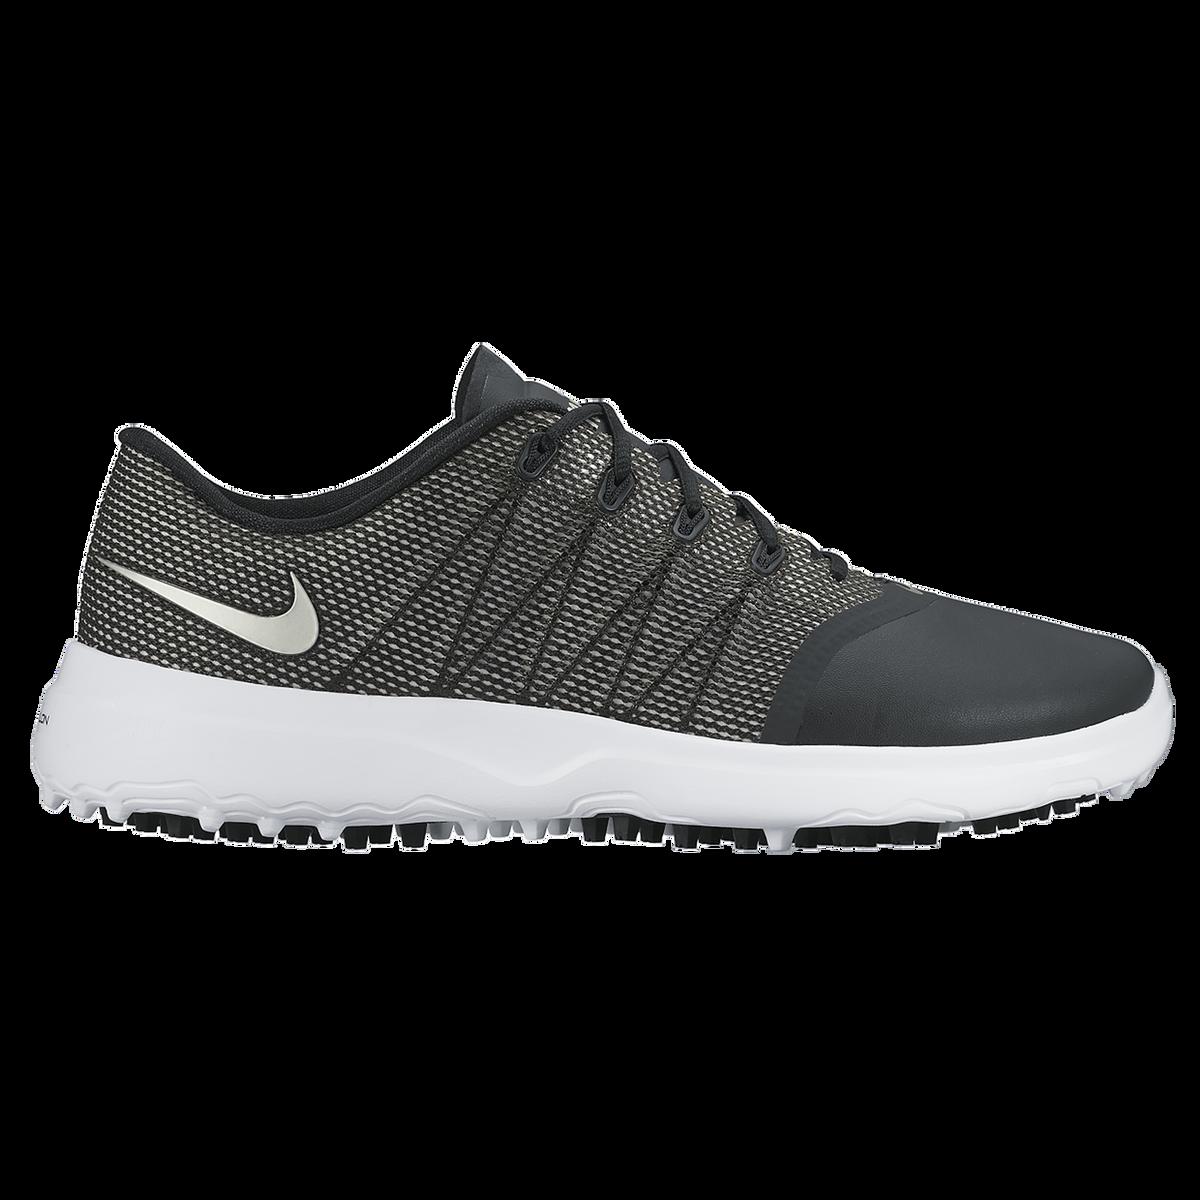 dcd234e6abac Nike Lunar Empress 2 Women s Golf Shoe - Black Silver